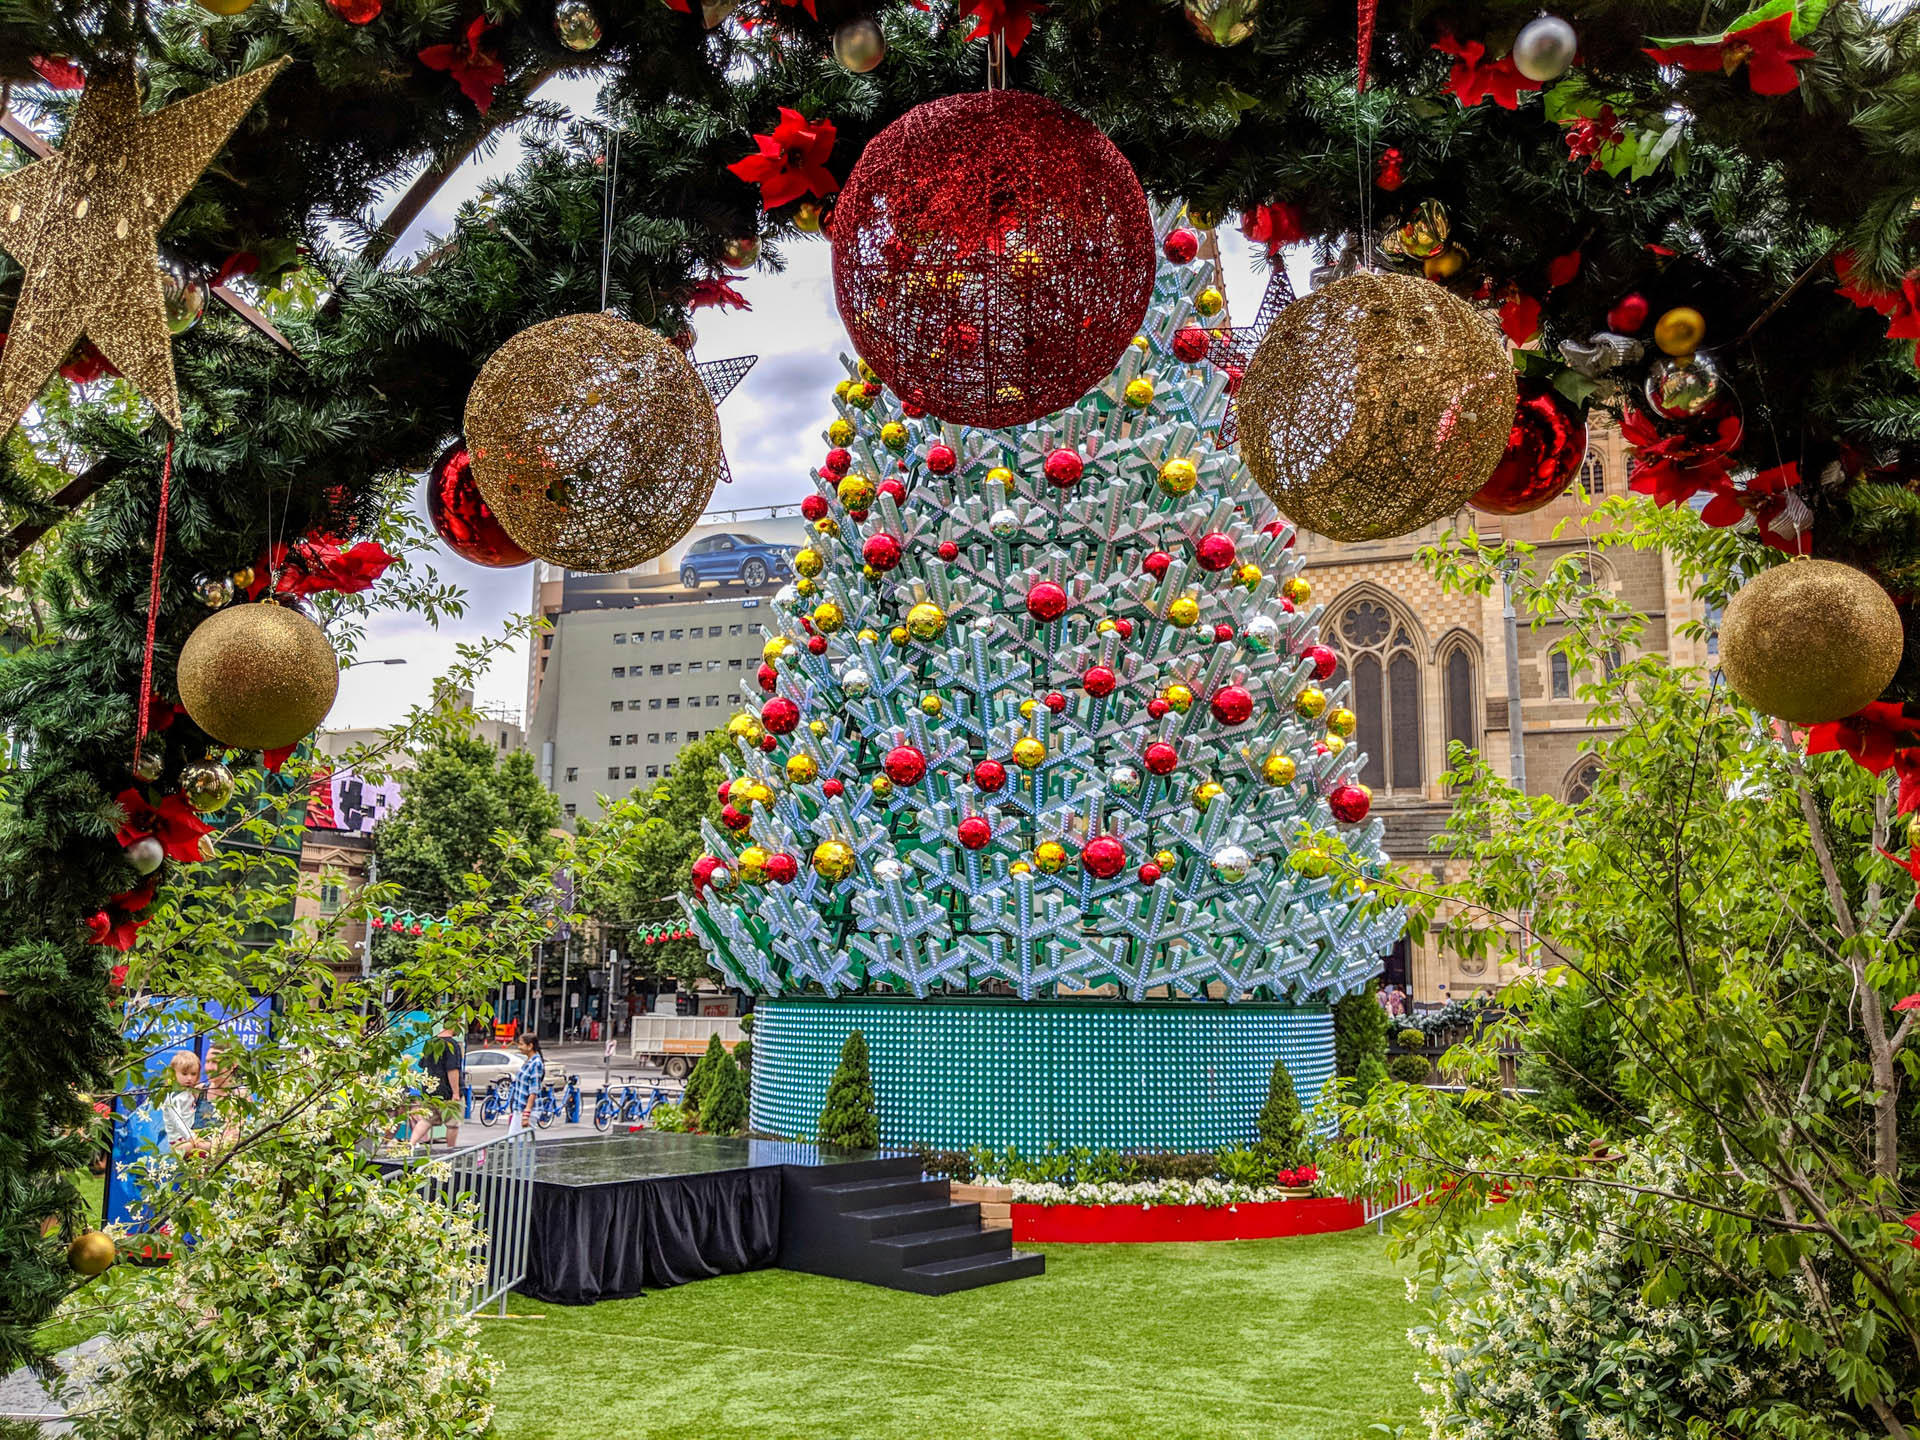 myer melbourne christmas trees